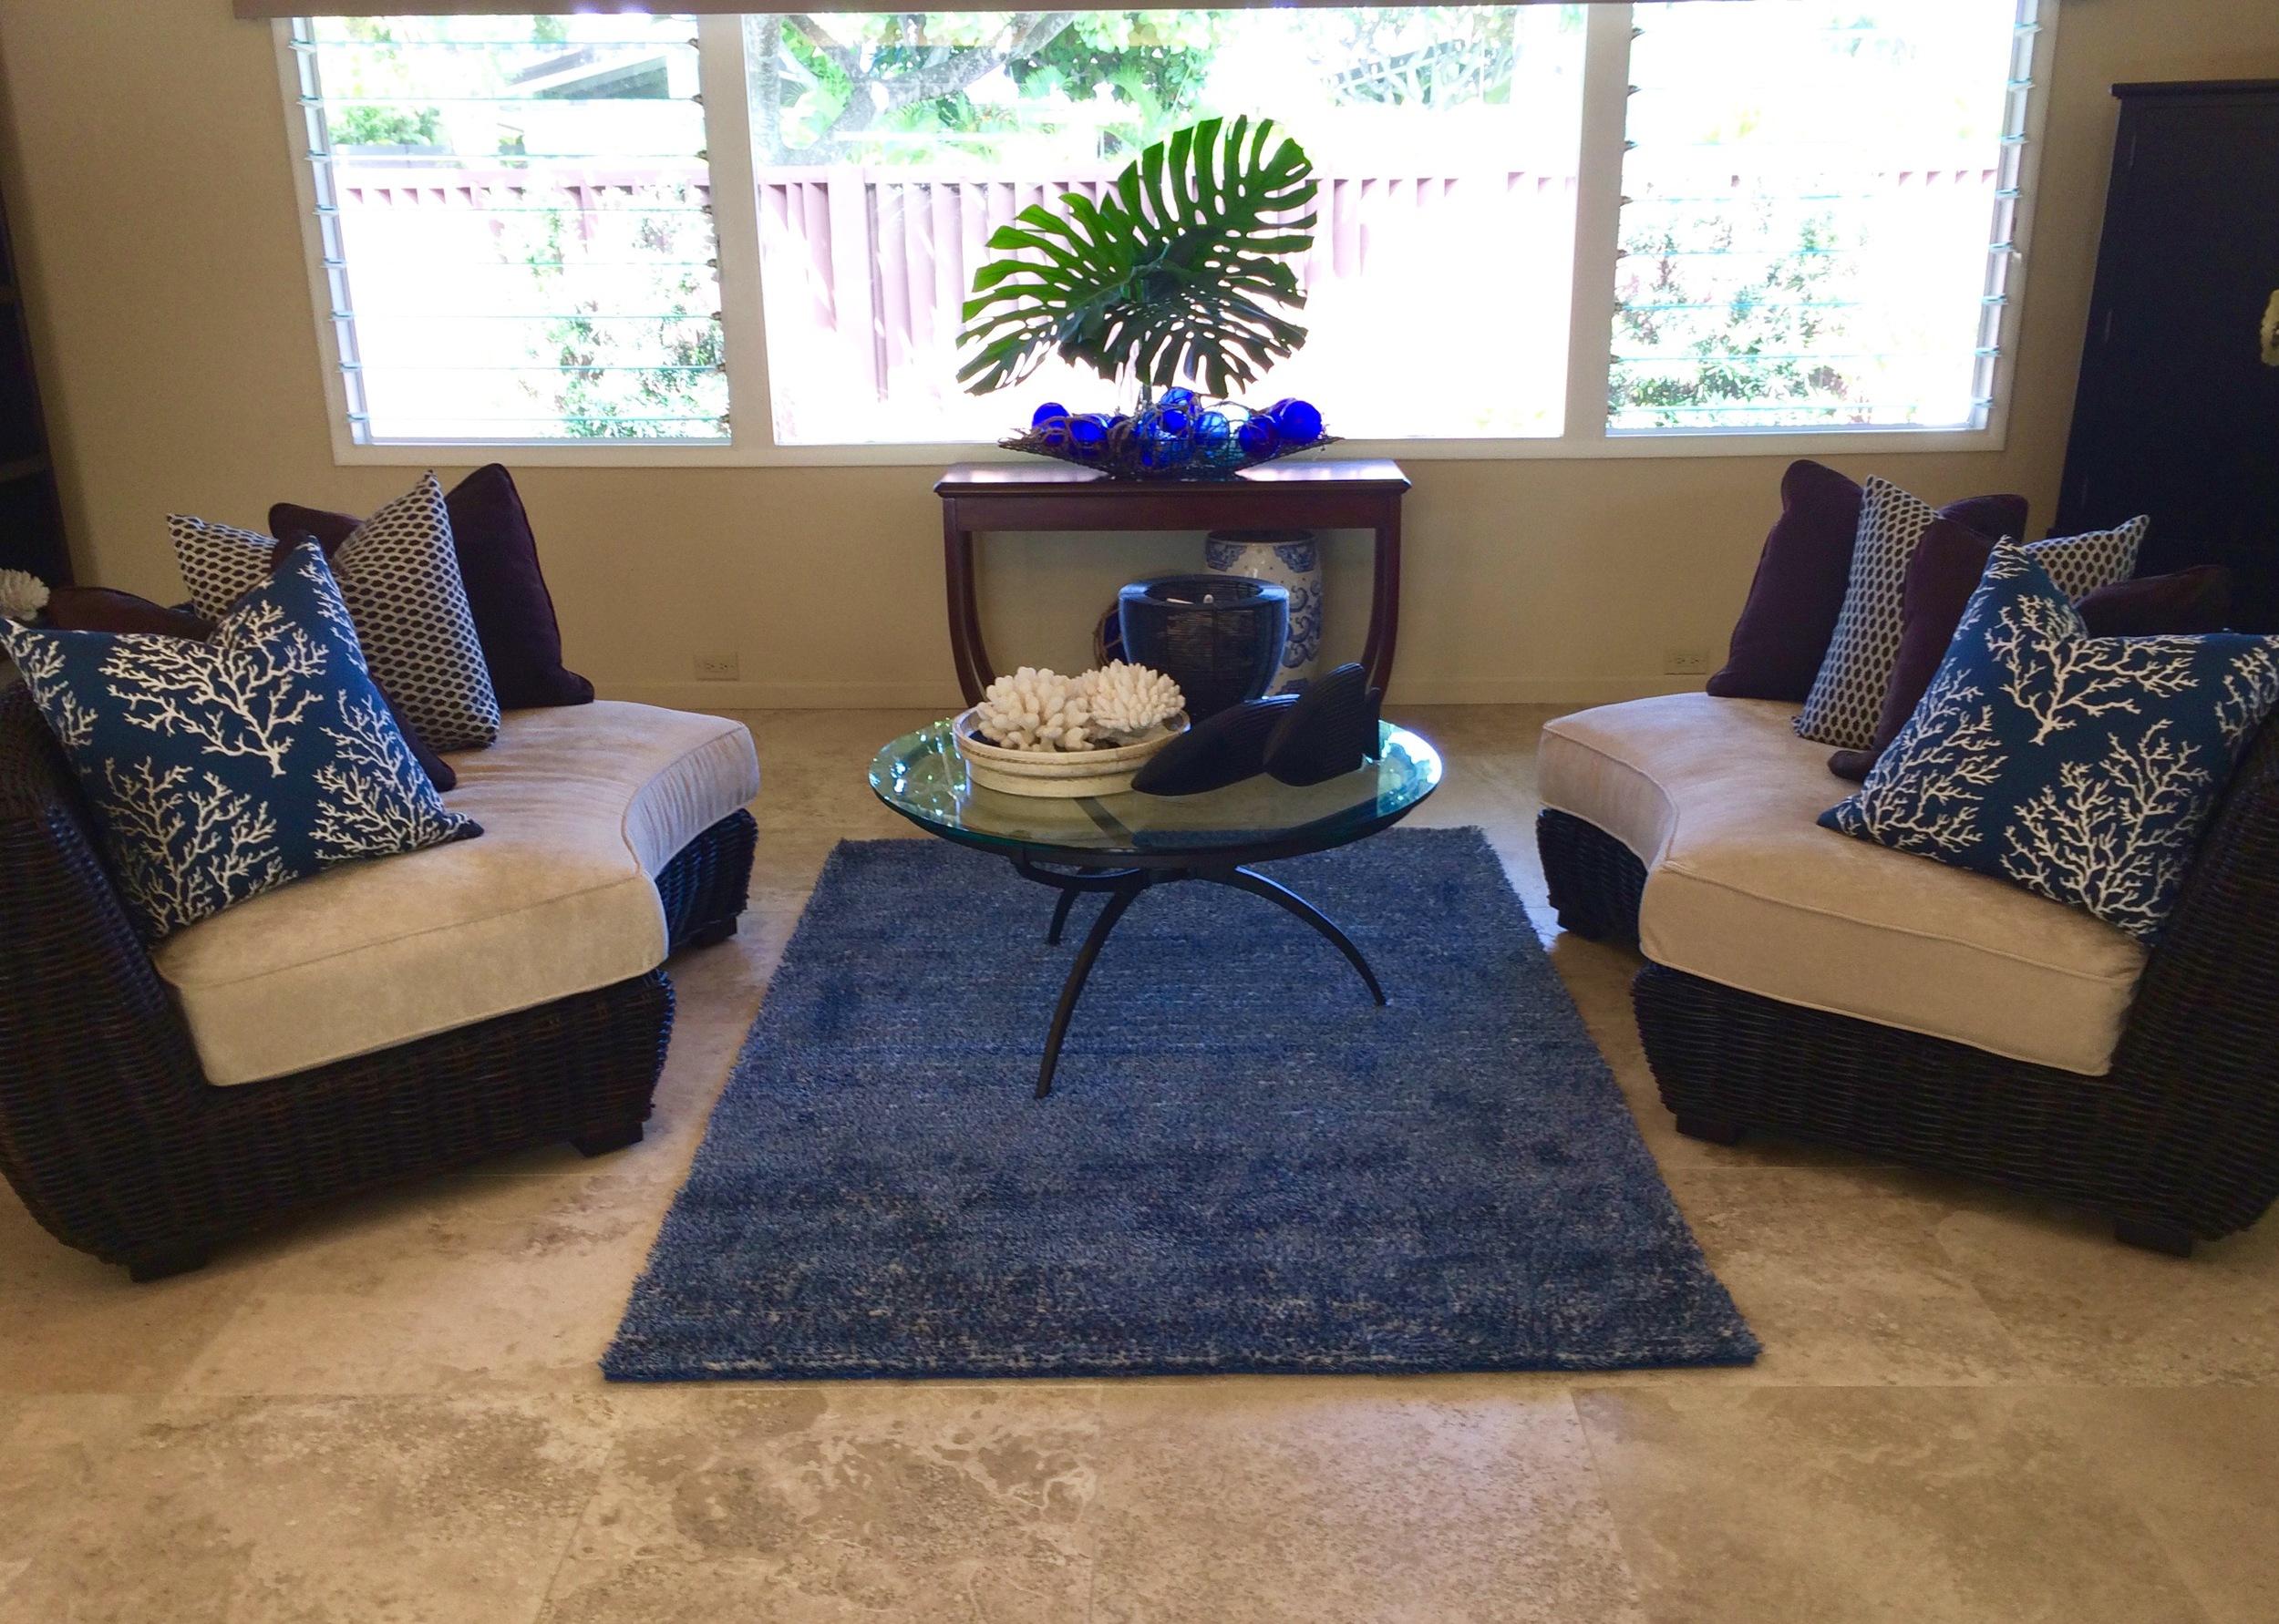 111 Kaiolino Way Luxury Home Staging Hawaii, Home Staging,Best Home Stagers Hawaii, Home Stagers in Hawaii, Stagers Hawaii, Home Stager Hawaii, Luxury Home Stager Hawaii